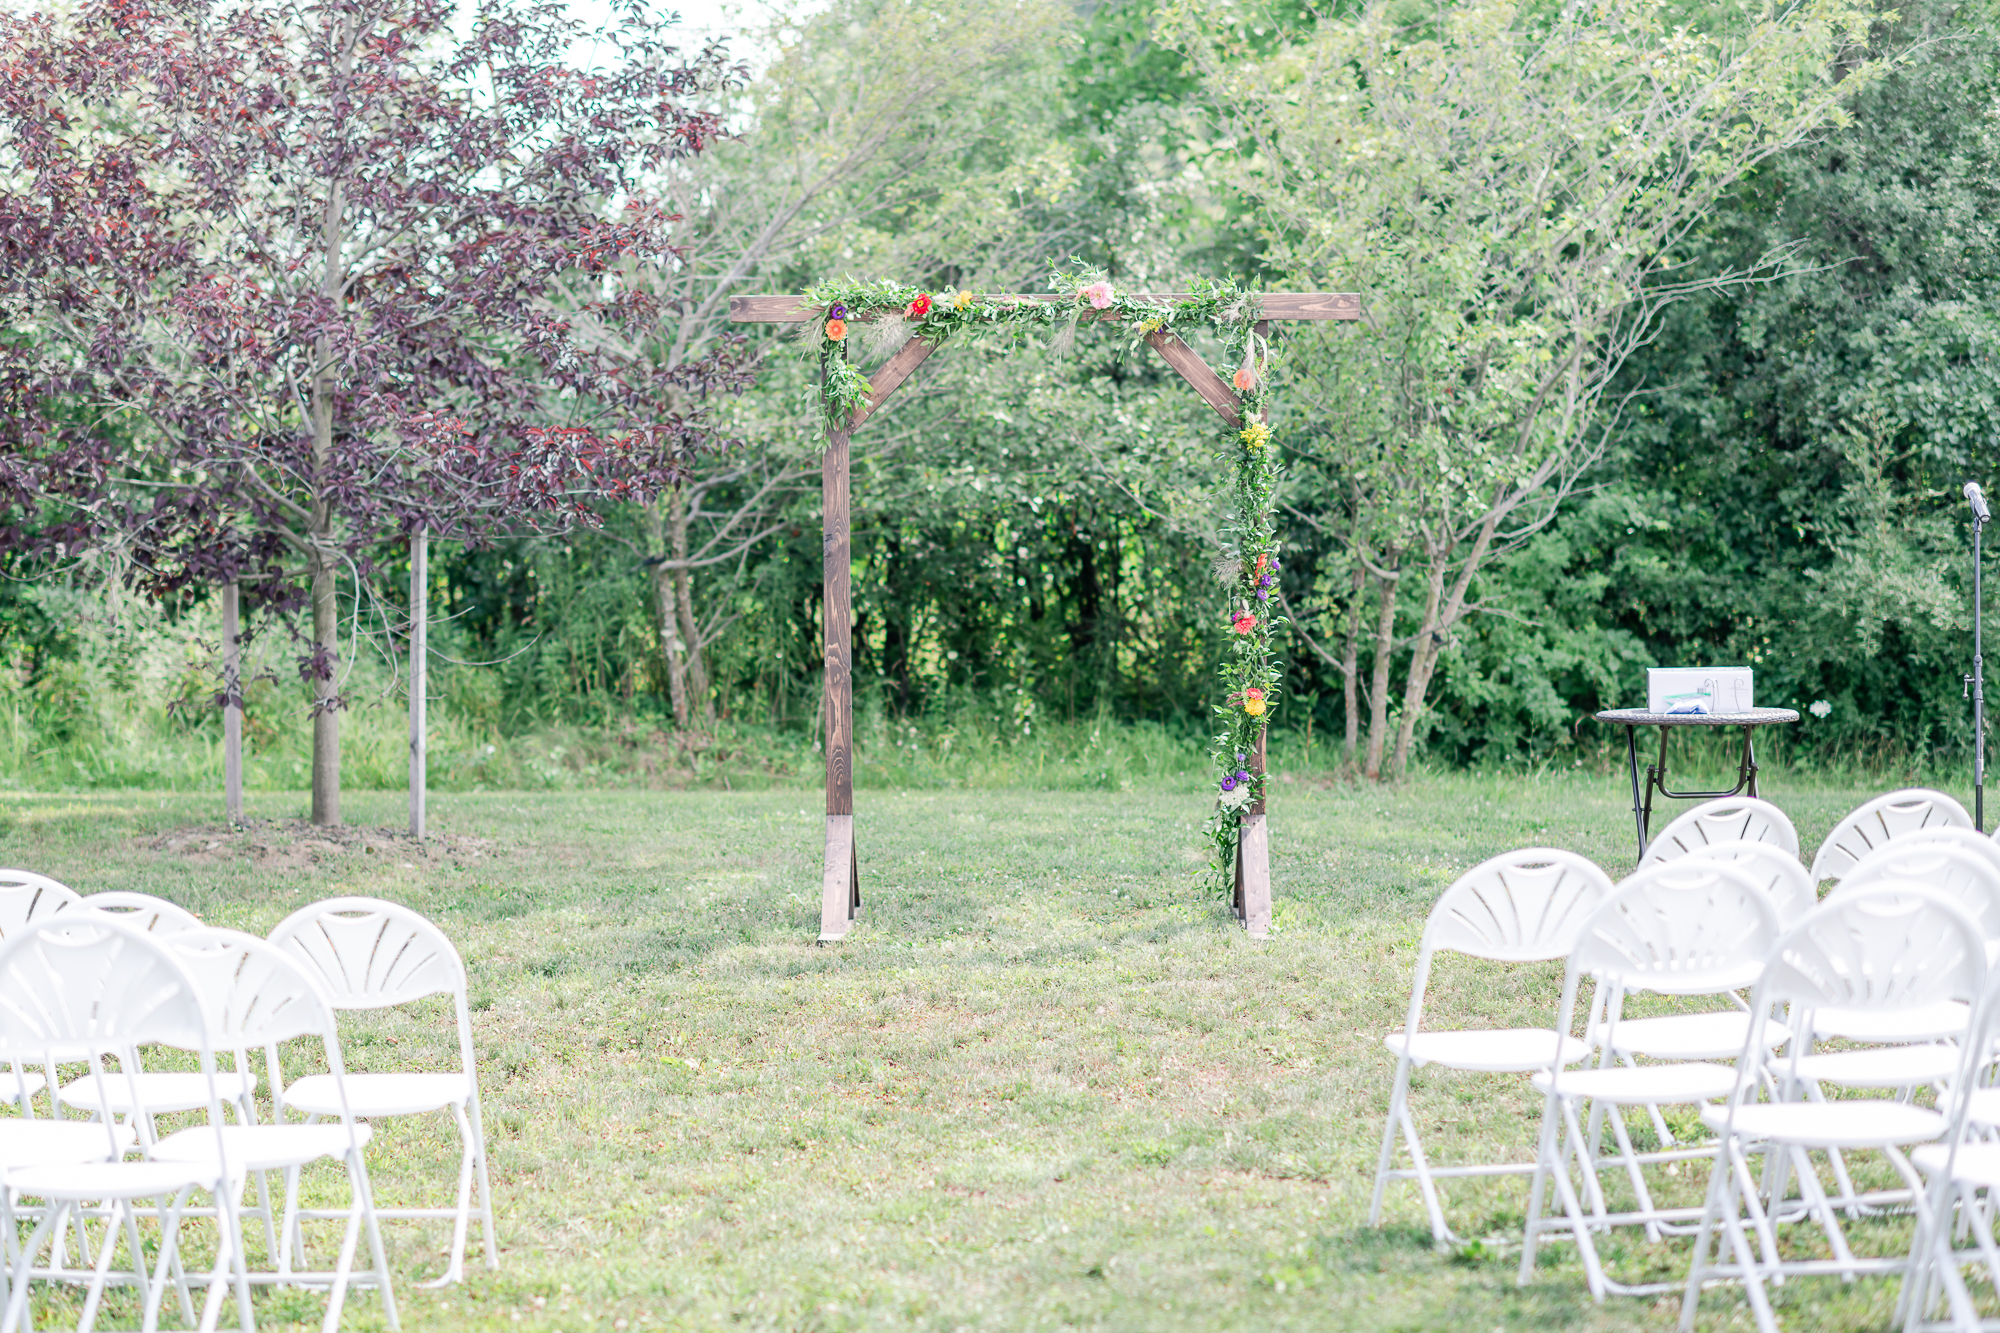 Maria+Adam_Summer Barn Wedding_The Barn at The North Star Preserve_Oberlin_Ohio-163.jpg